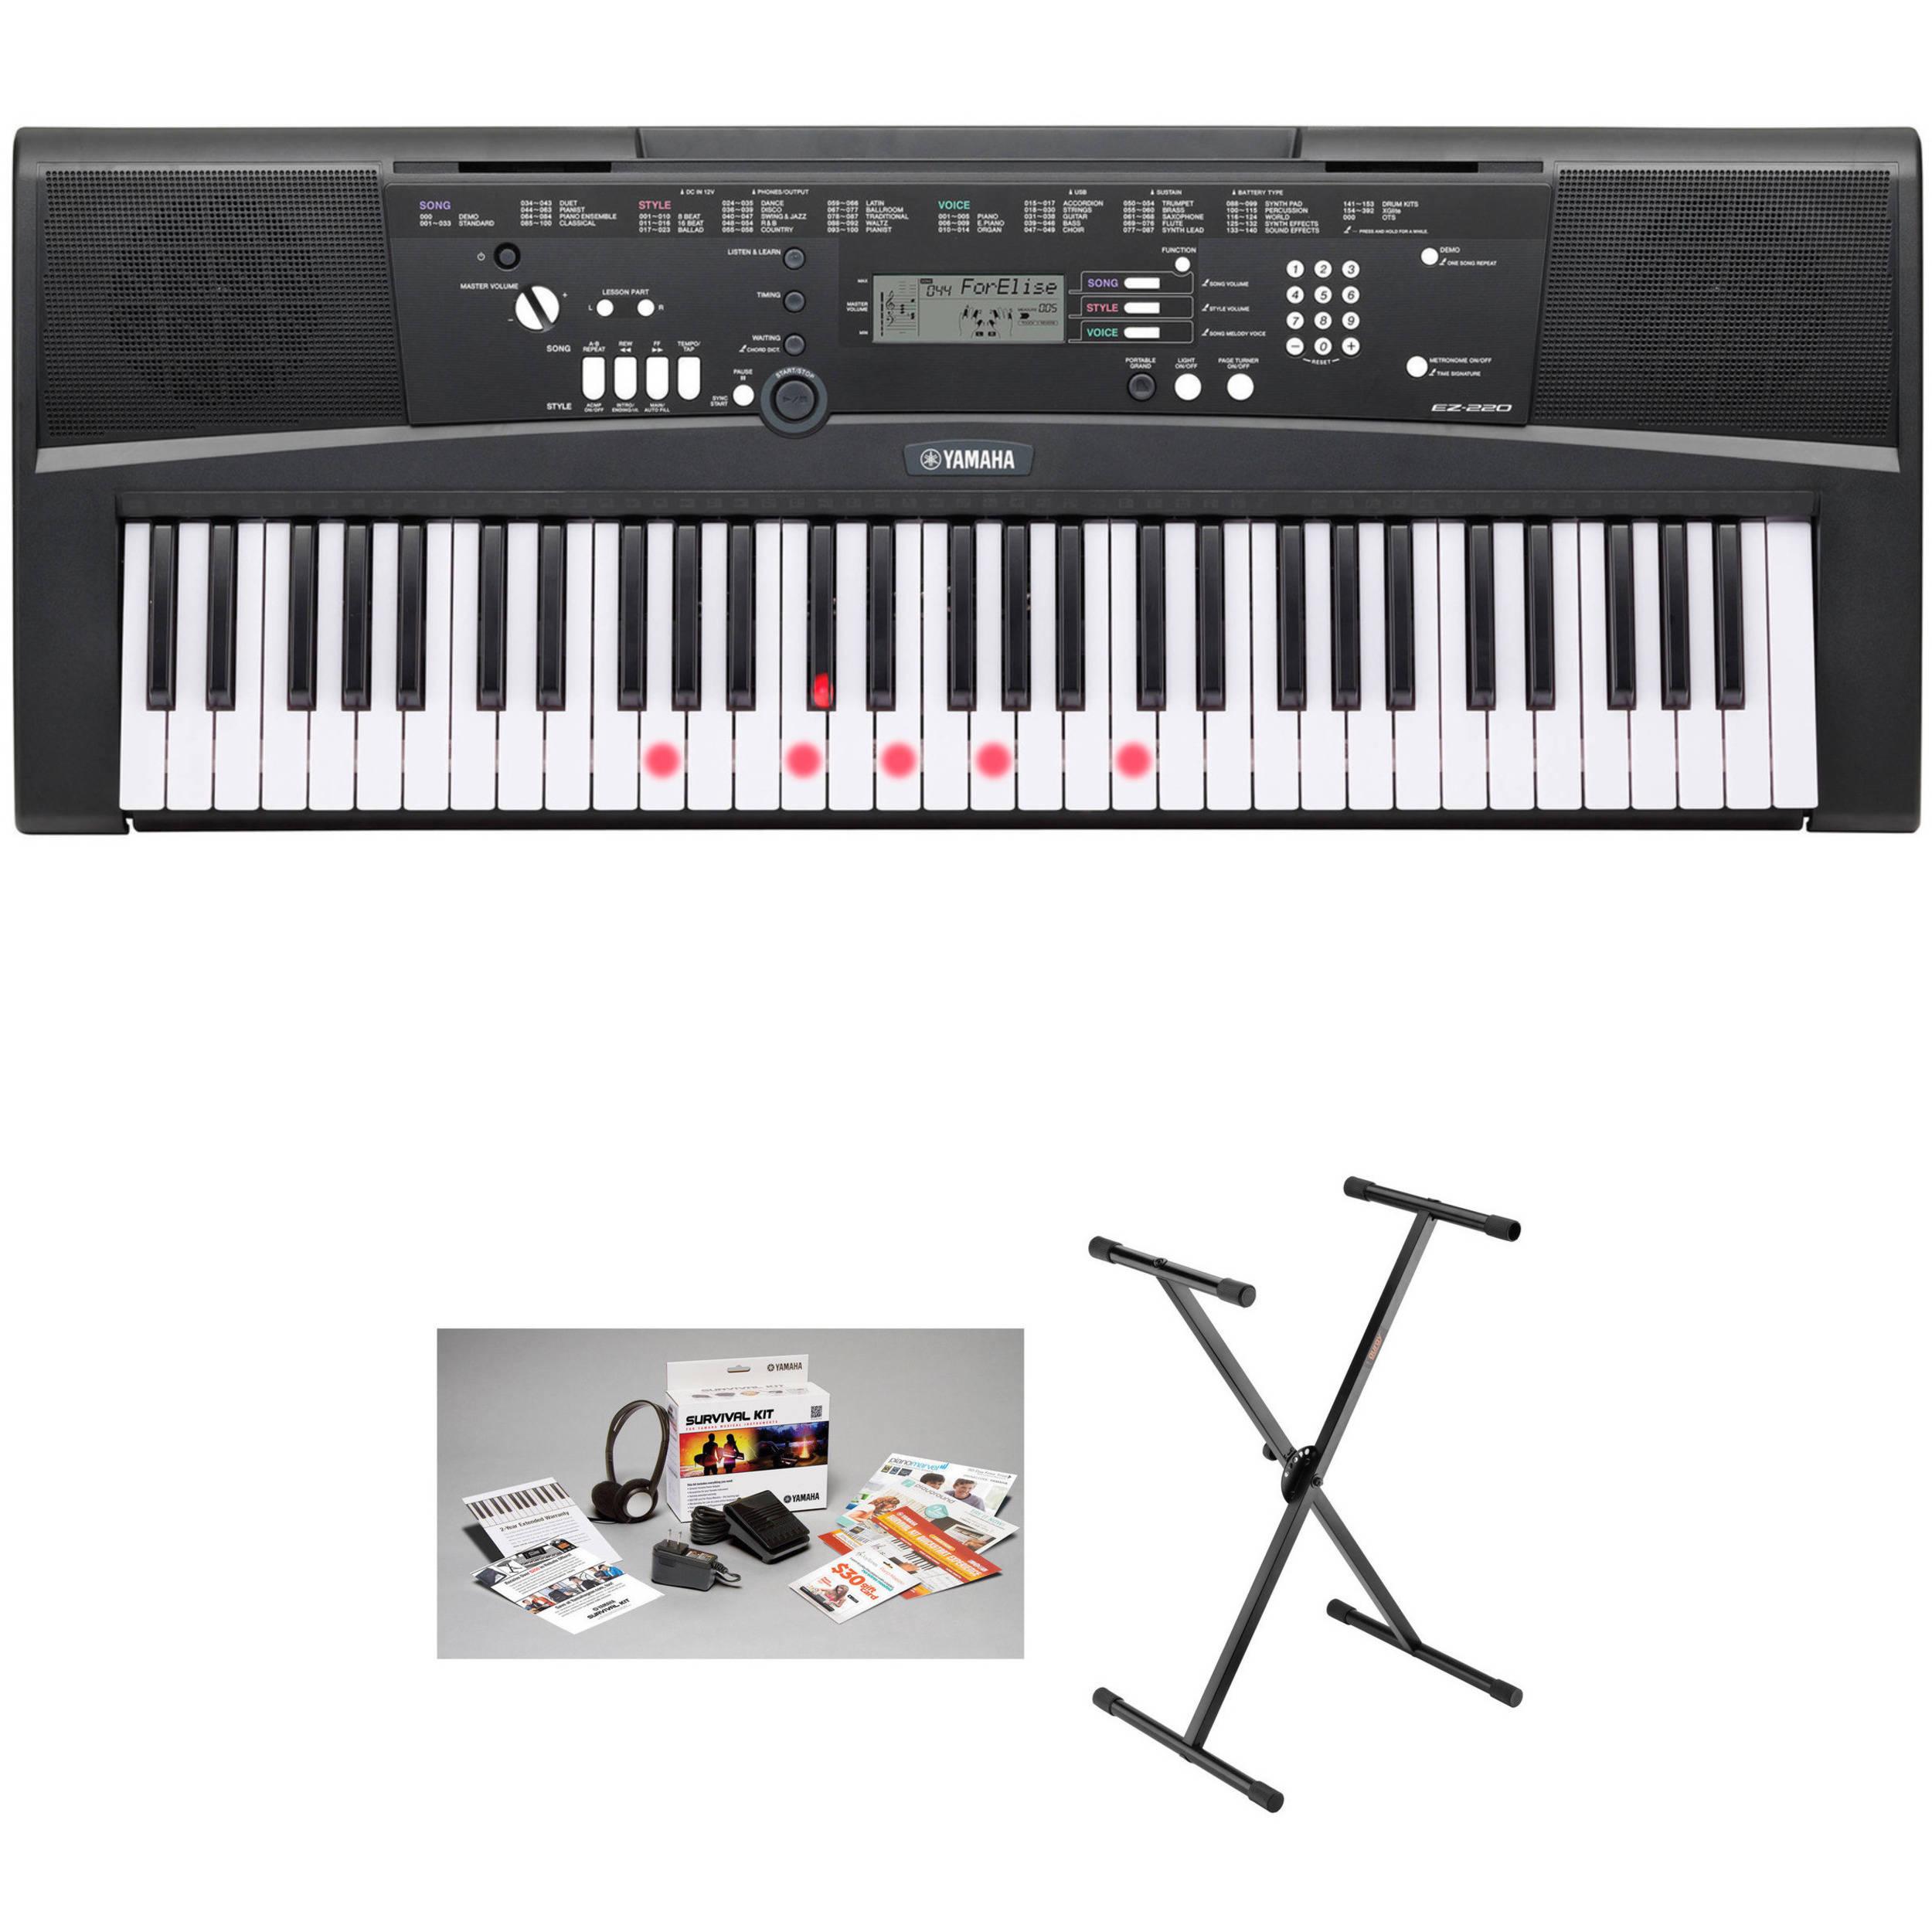 yan AC//DC Power Supply Adapter for Casio CTK-611 CTK-2000 Keyboard